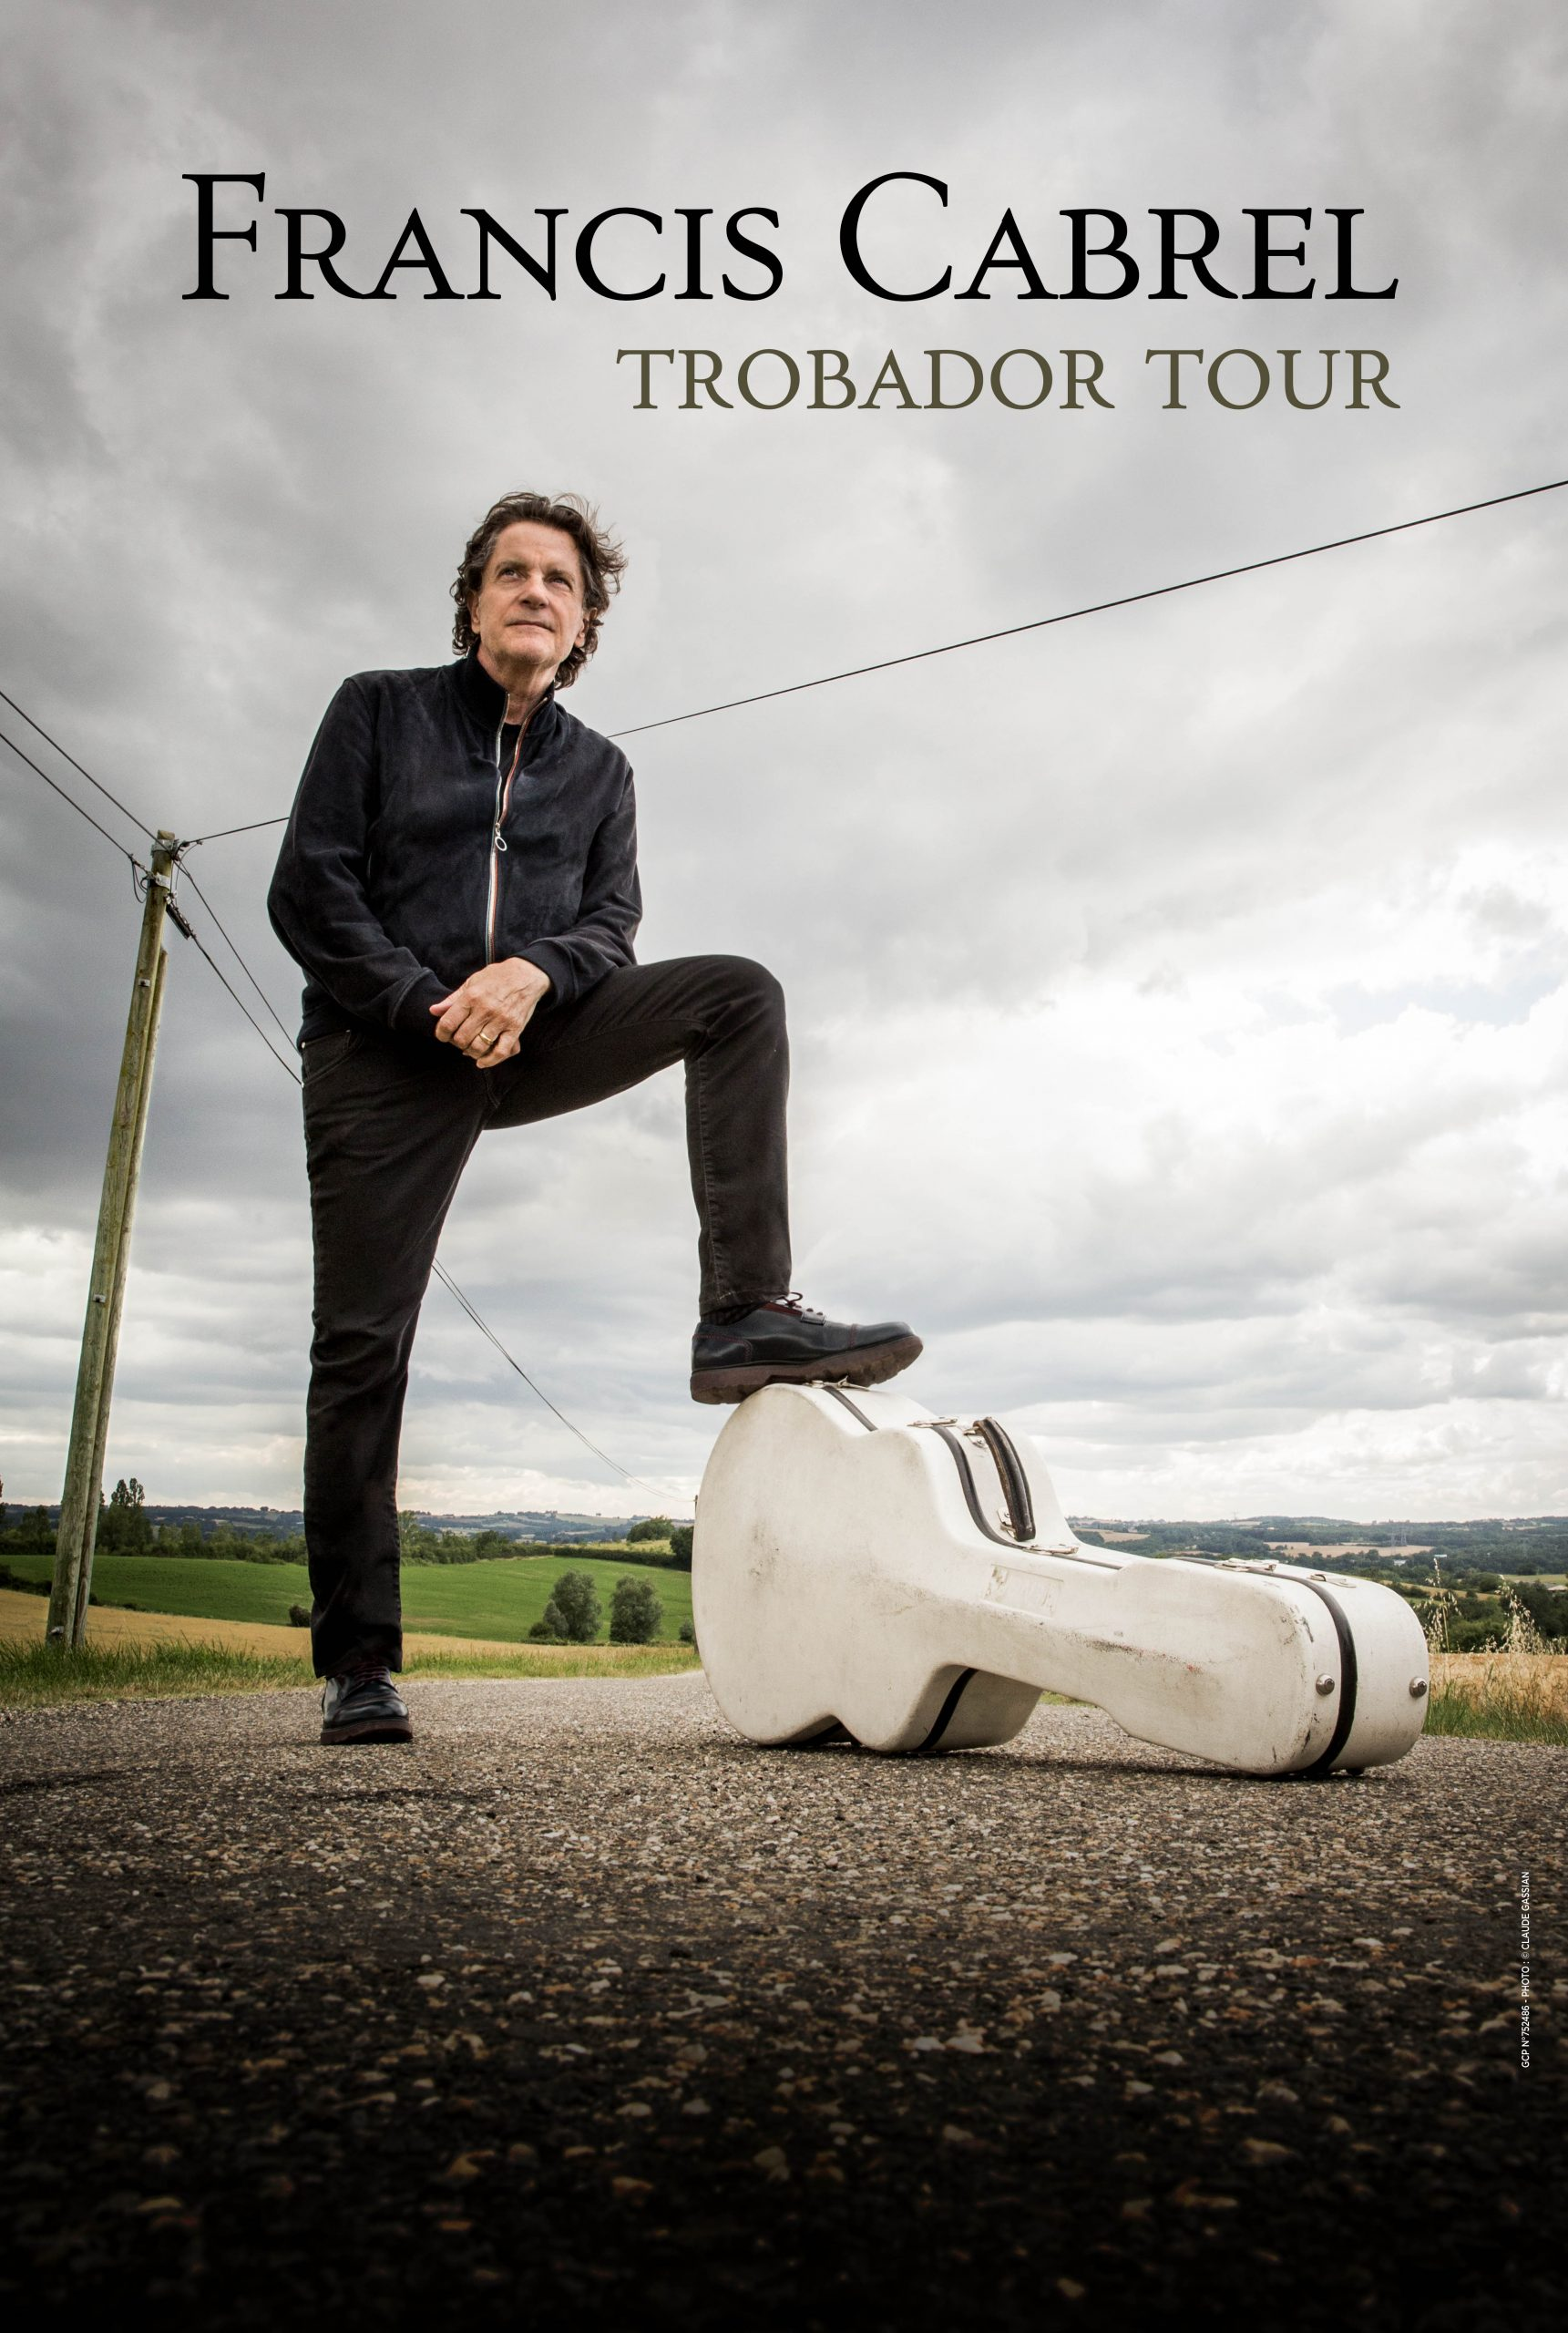 Francis Cabrel tournée concert TROBADOR tour